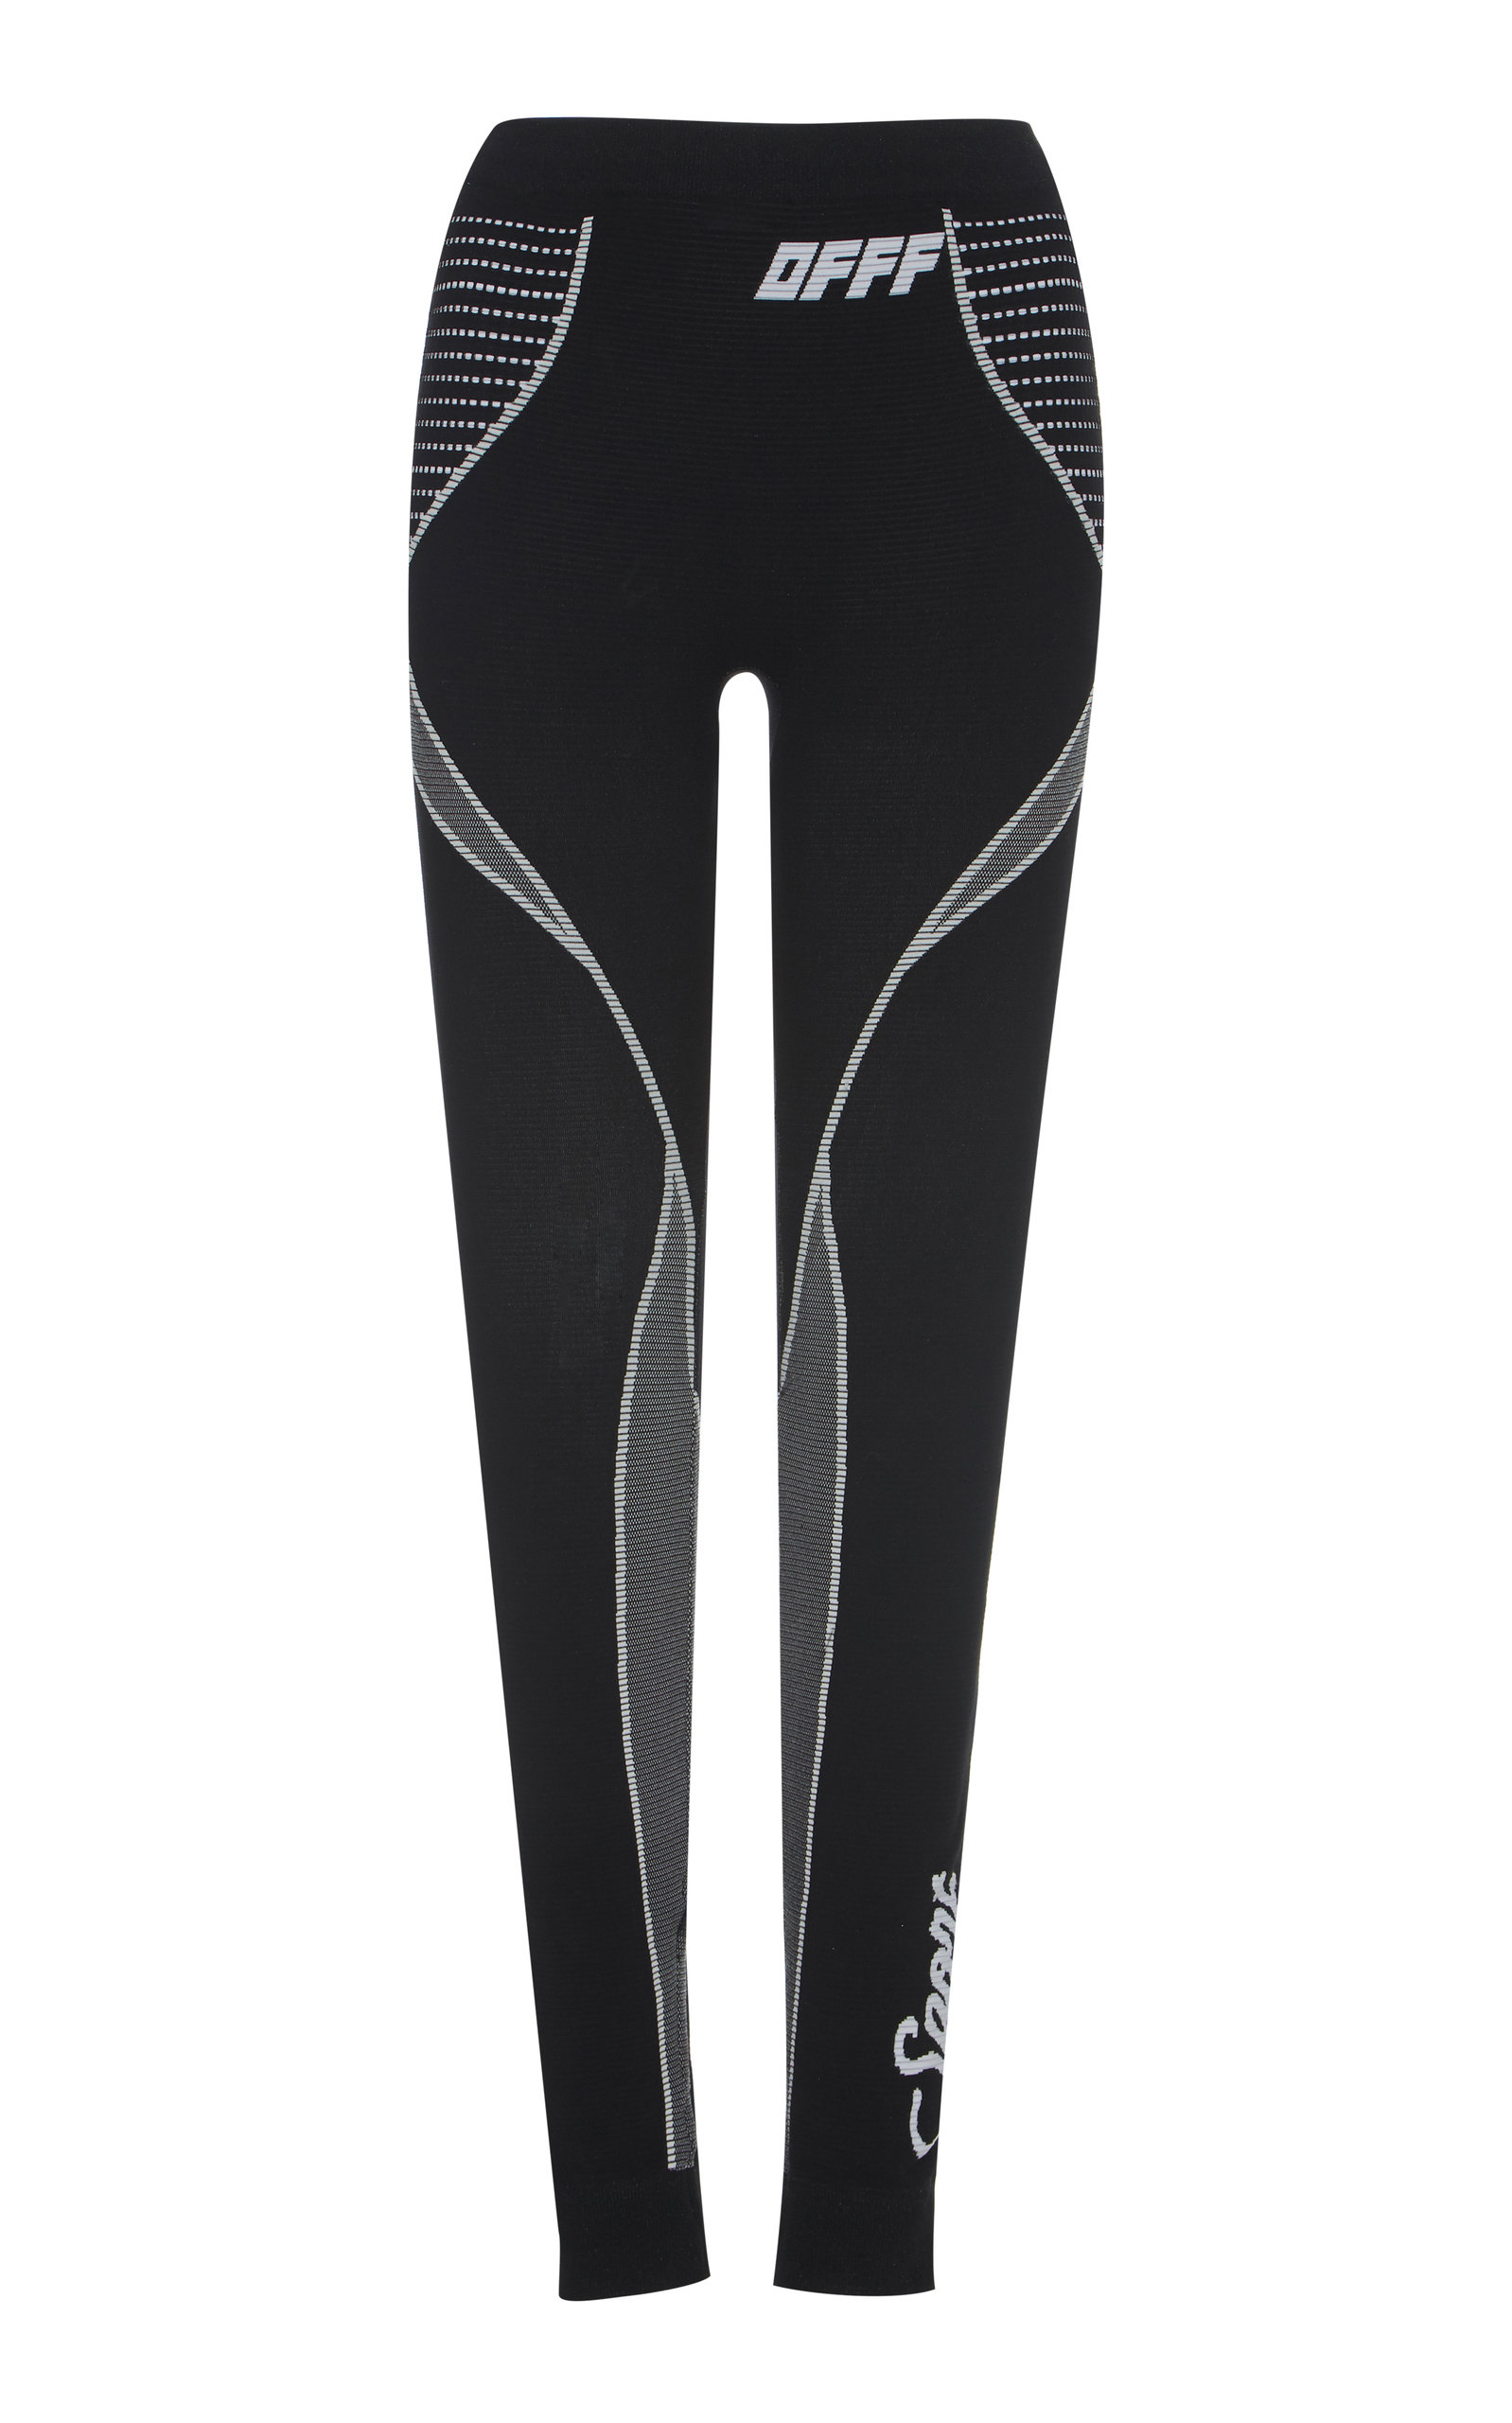 2c02eb98c7d8d Logo-Printed Stretch Leggings by Off-White c/o Virgil Abloh   Moda ...